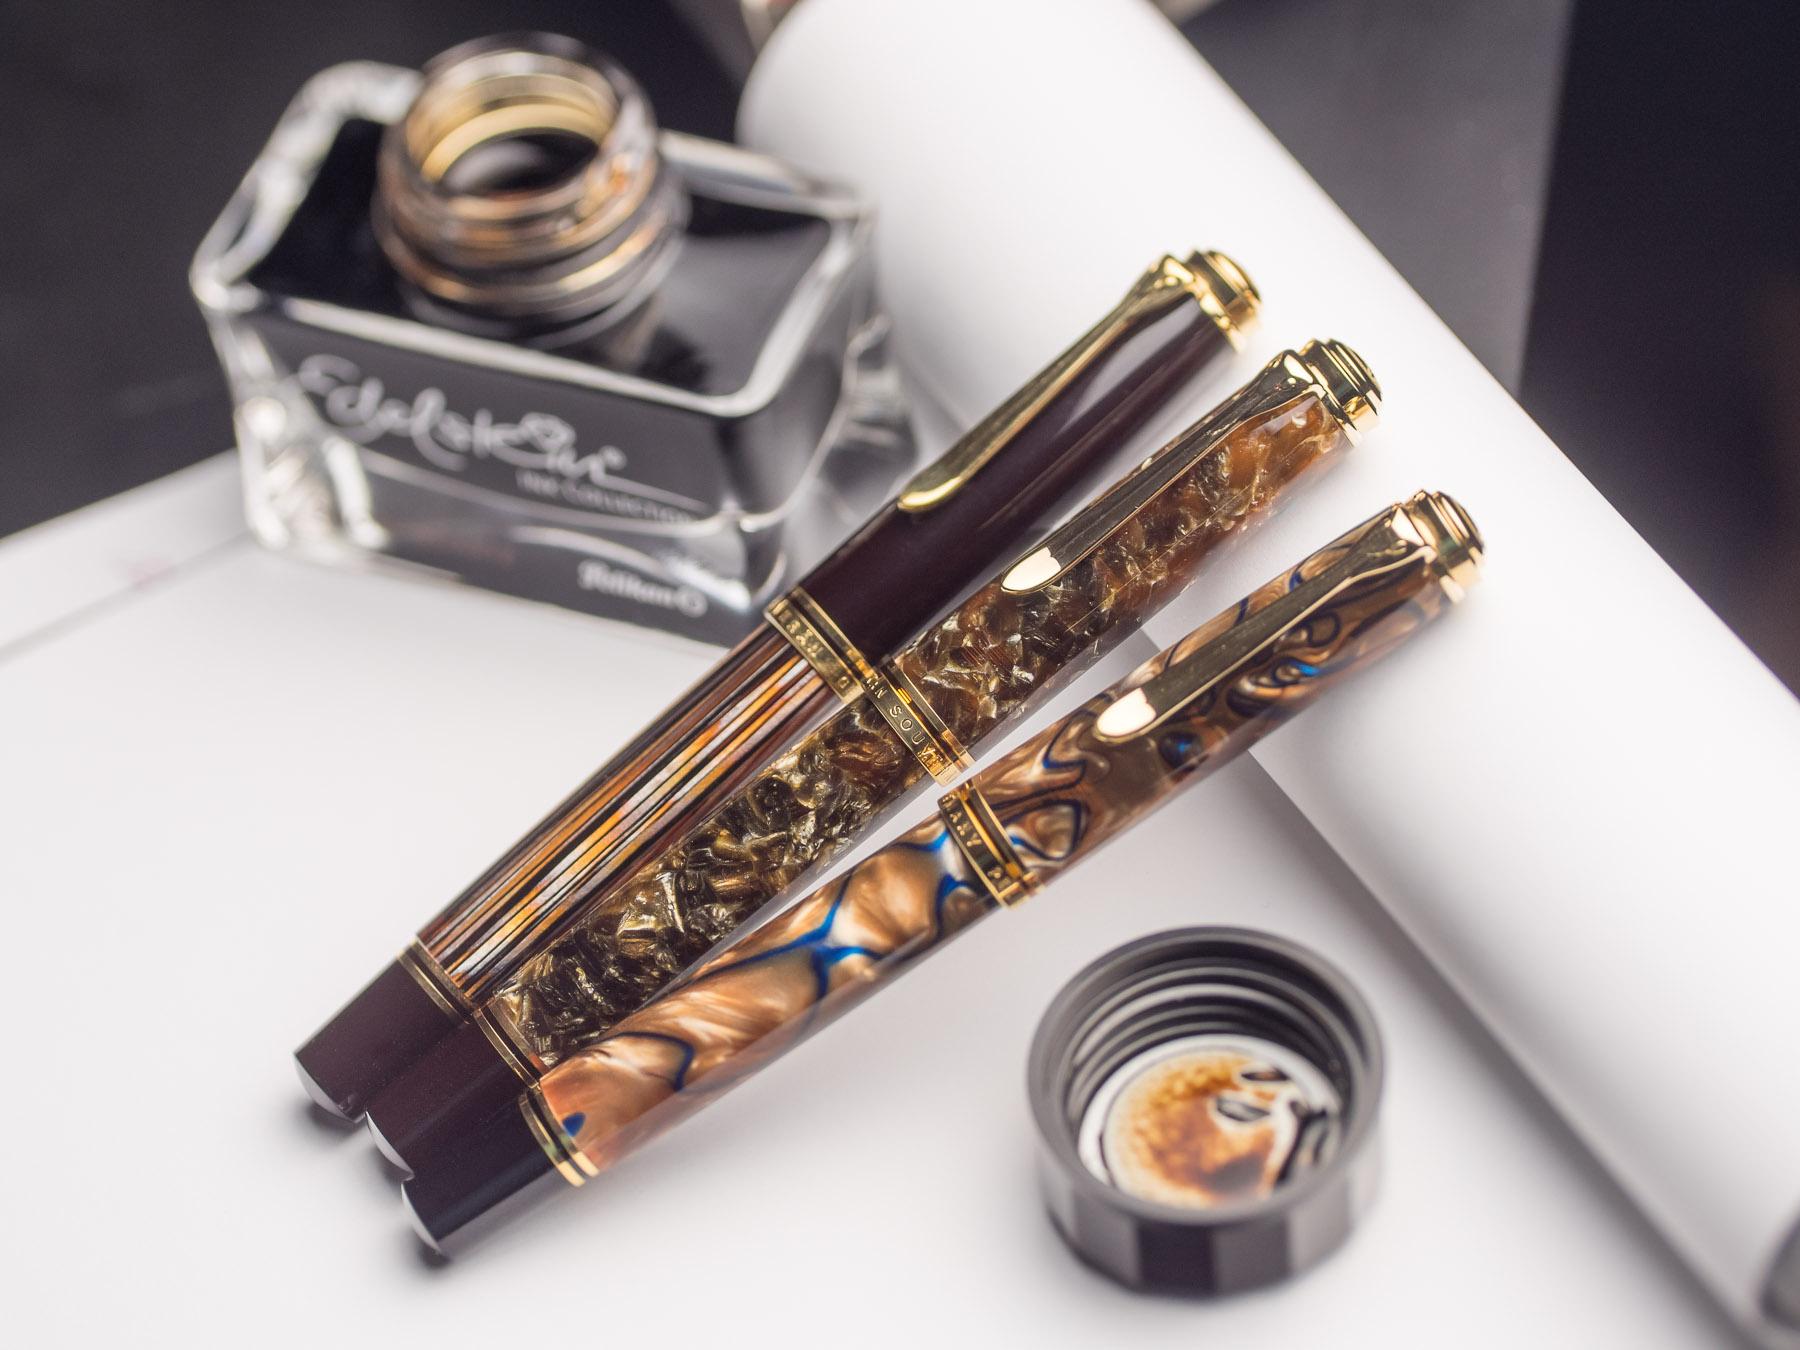 pelikan_m800_renaissance_brown_fountain_pen-24